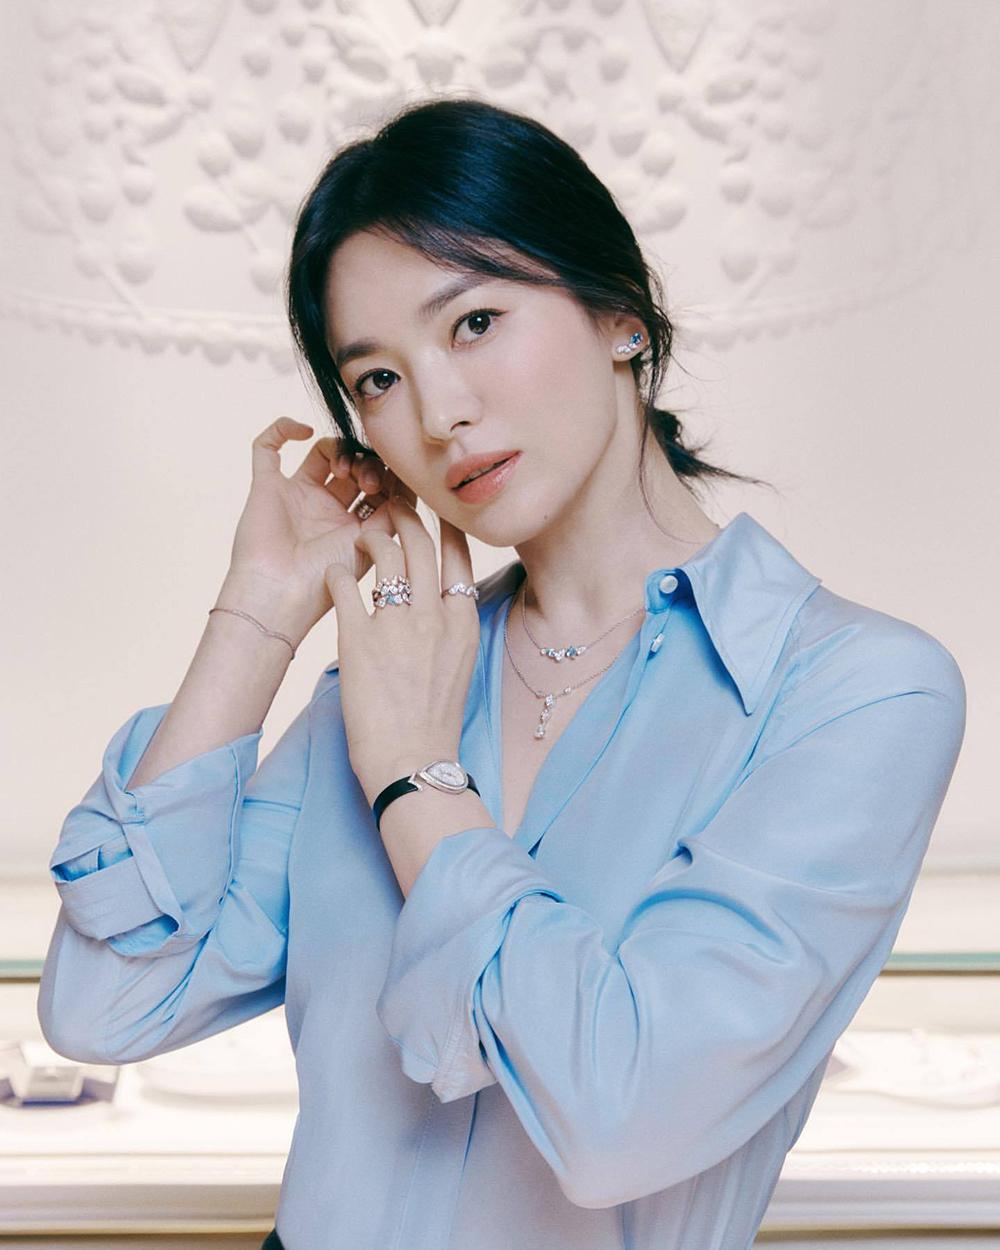 Nhan sắc Hye Kyo tuổi 40. Ảnh: Chaumet.